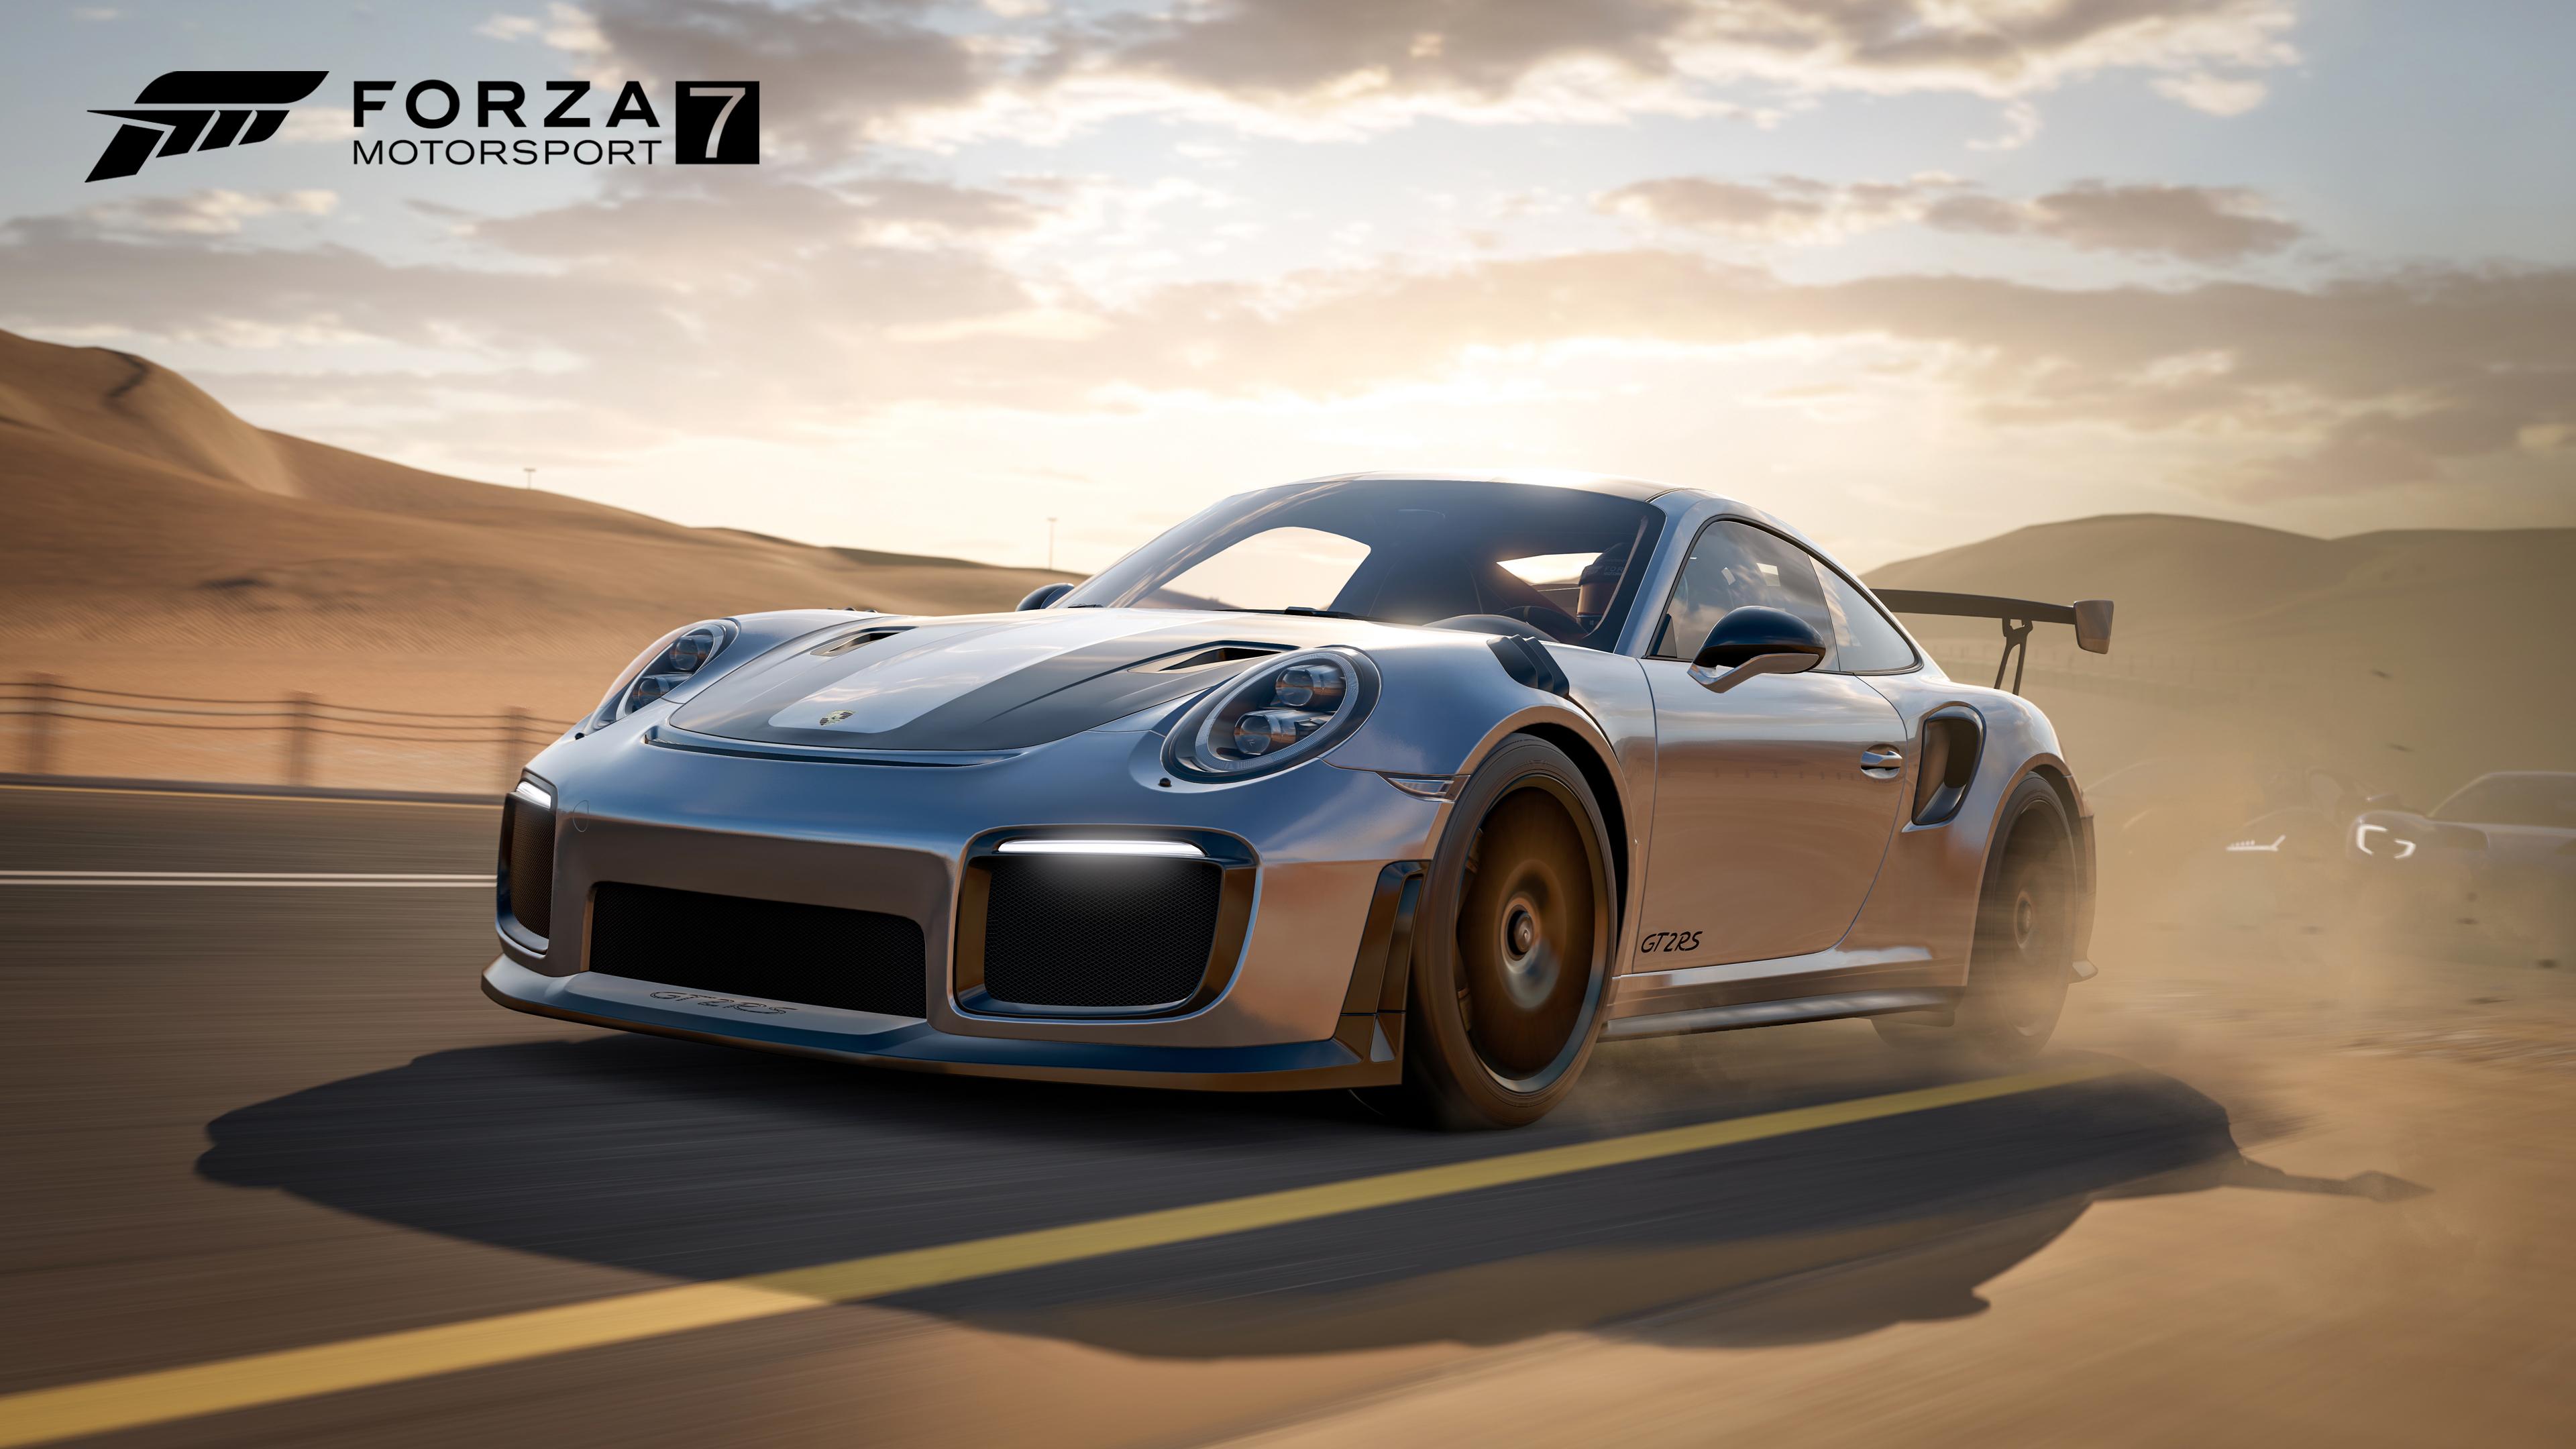 Forza Motorsport 7 Wallpaper HQ